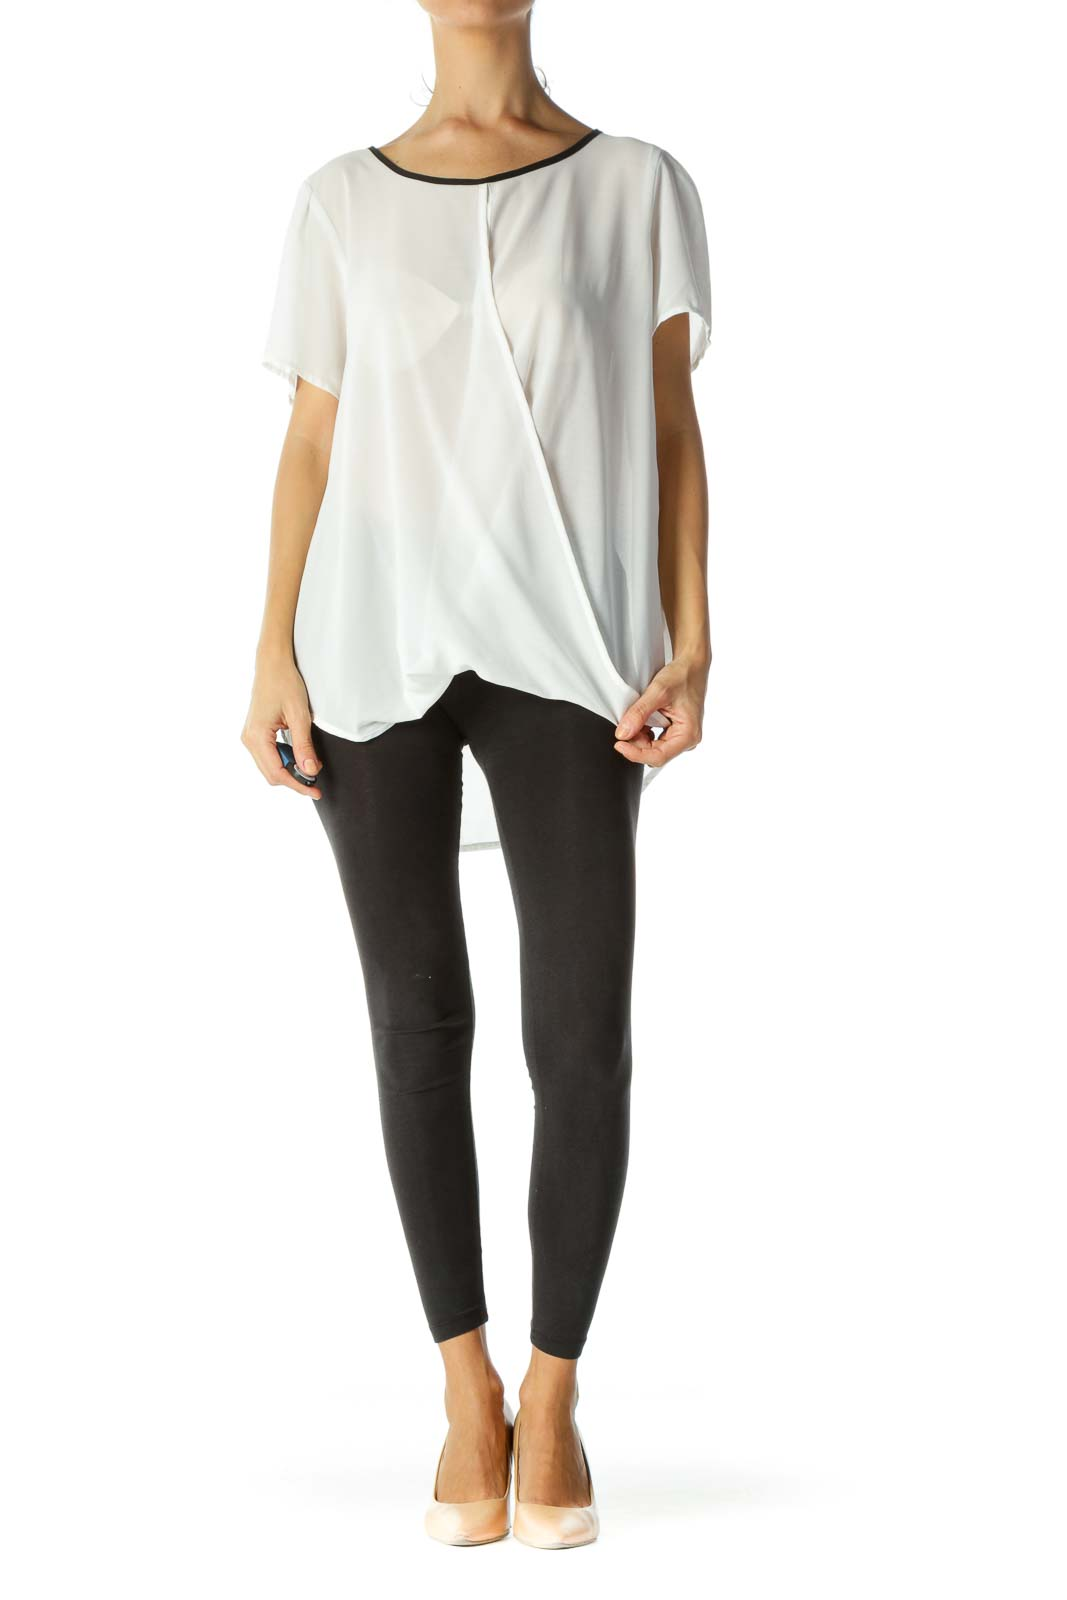 White&Black Sheer Wrap Top